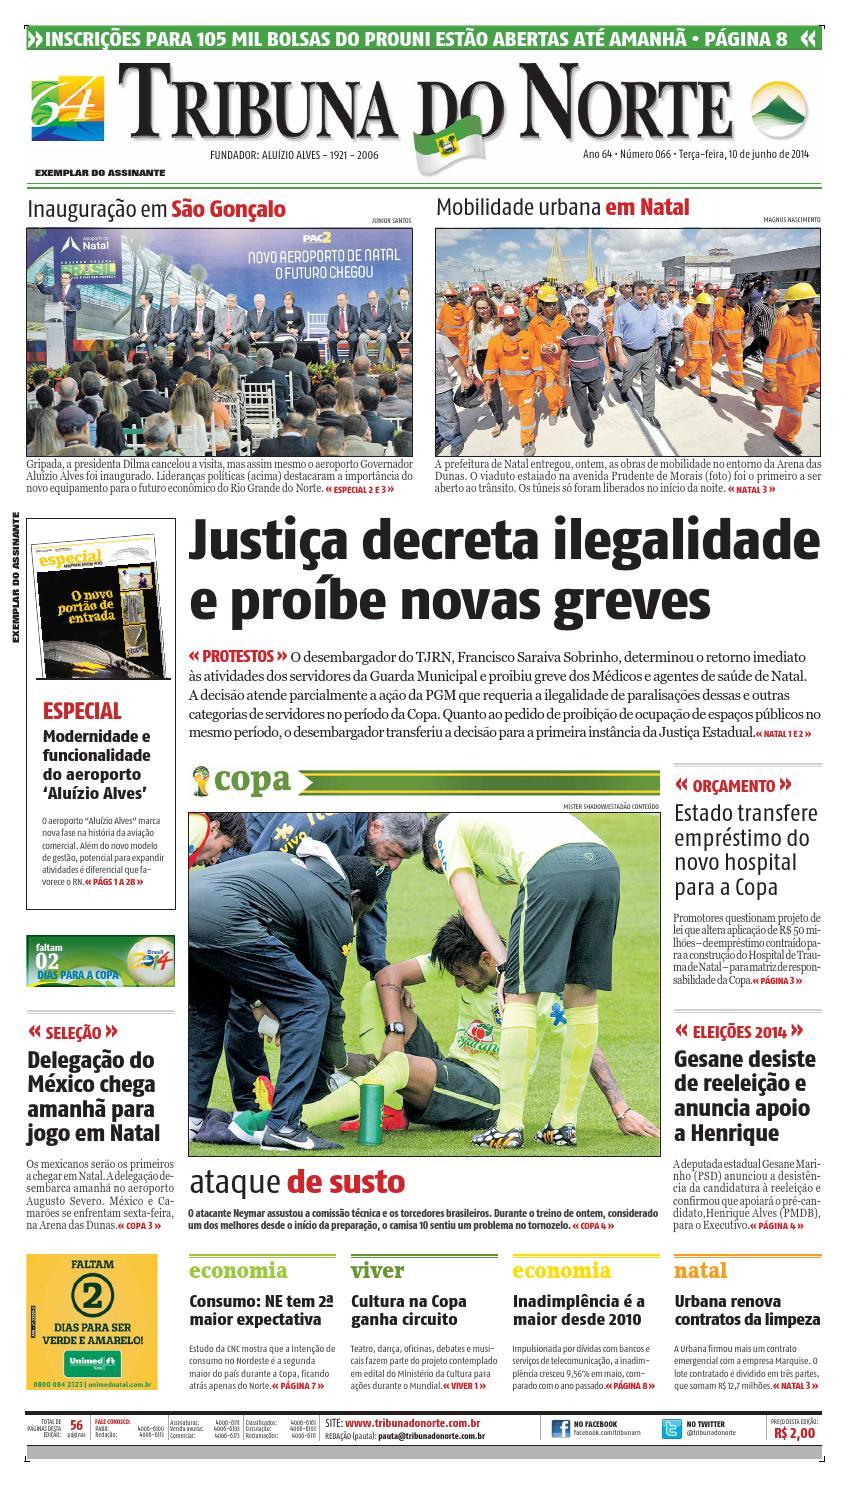 95a224917f Tribuna do Norte - 10 06 2014 by Empresa Jornalística Tribuna do Norte Ltda  - issuu